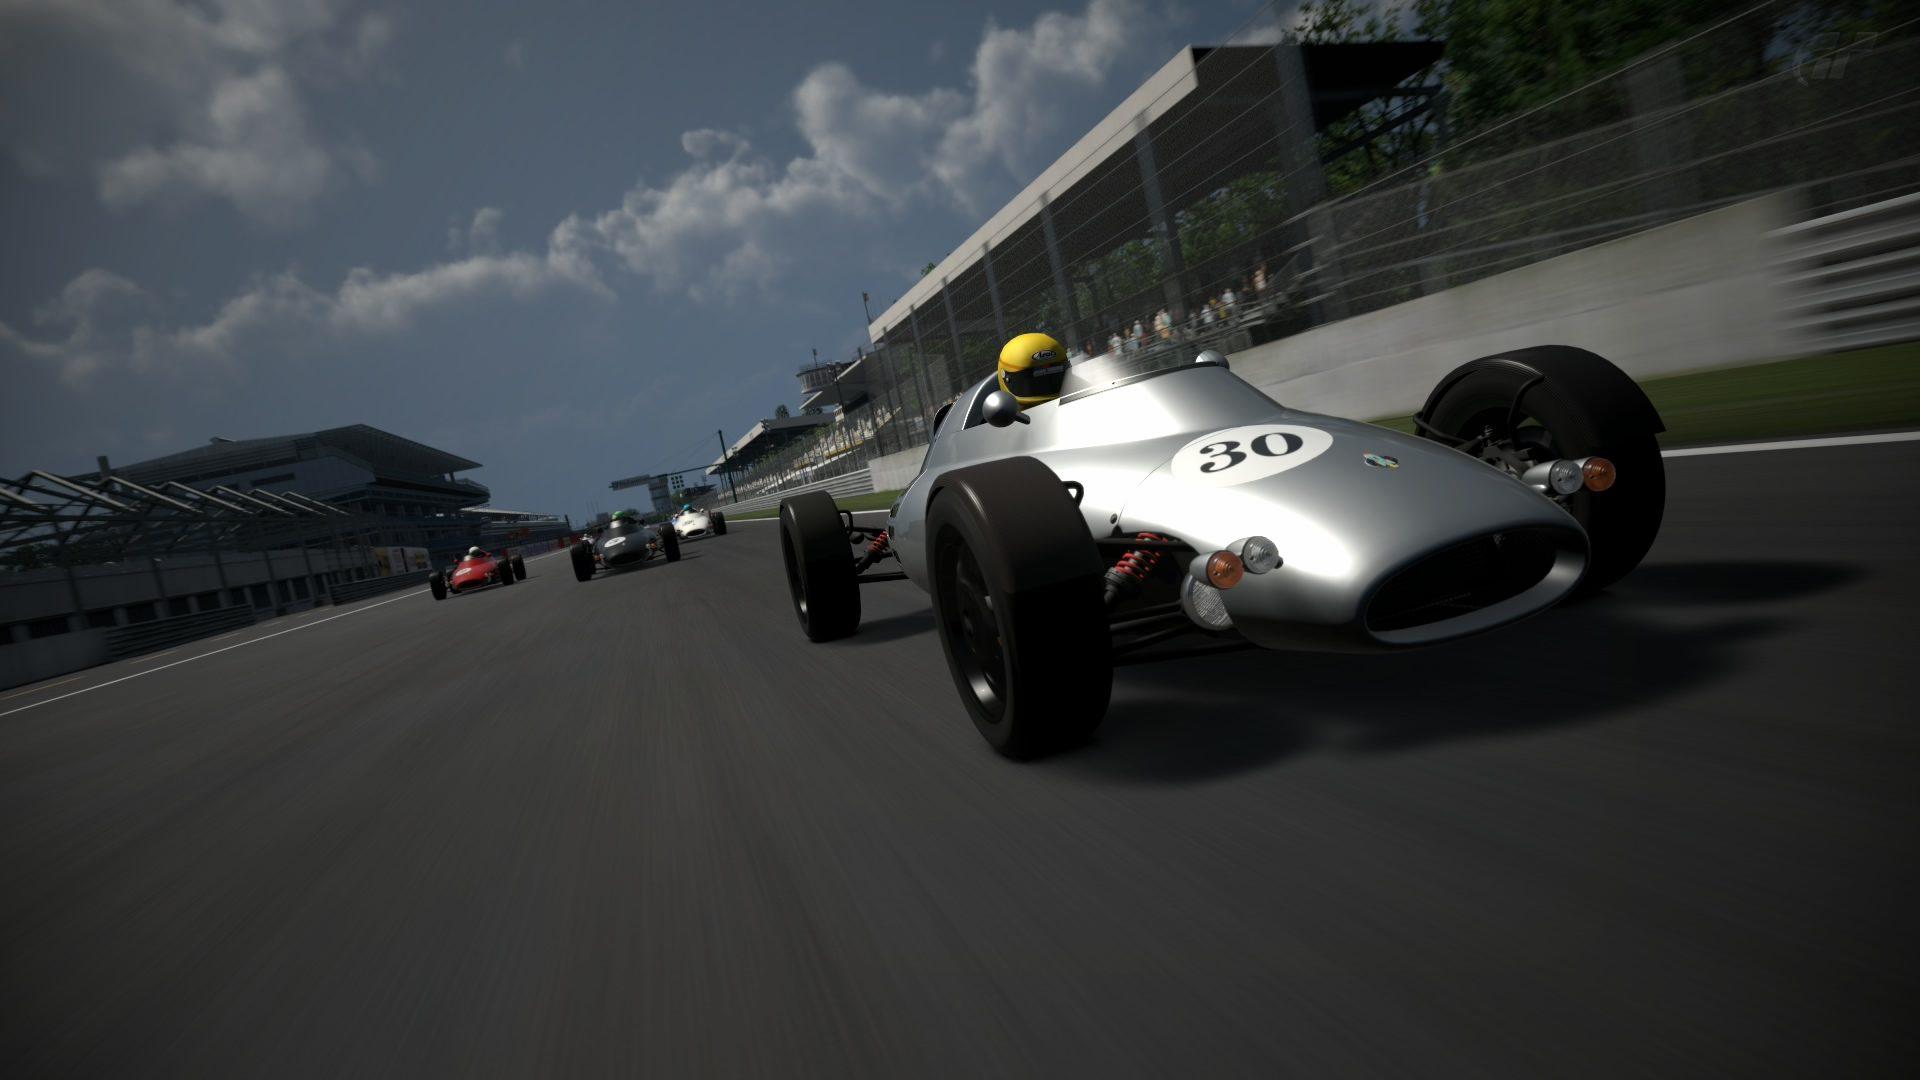 Autodromo Nazionale Monza '80s_3.jpg